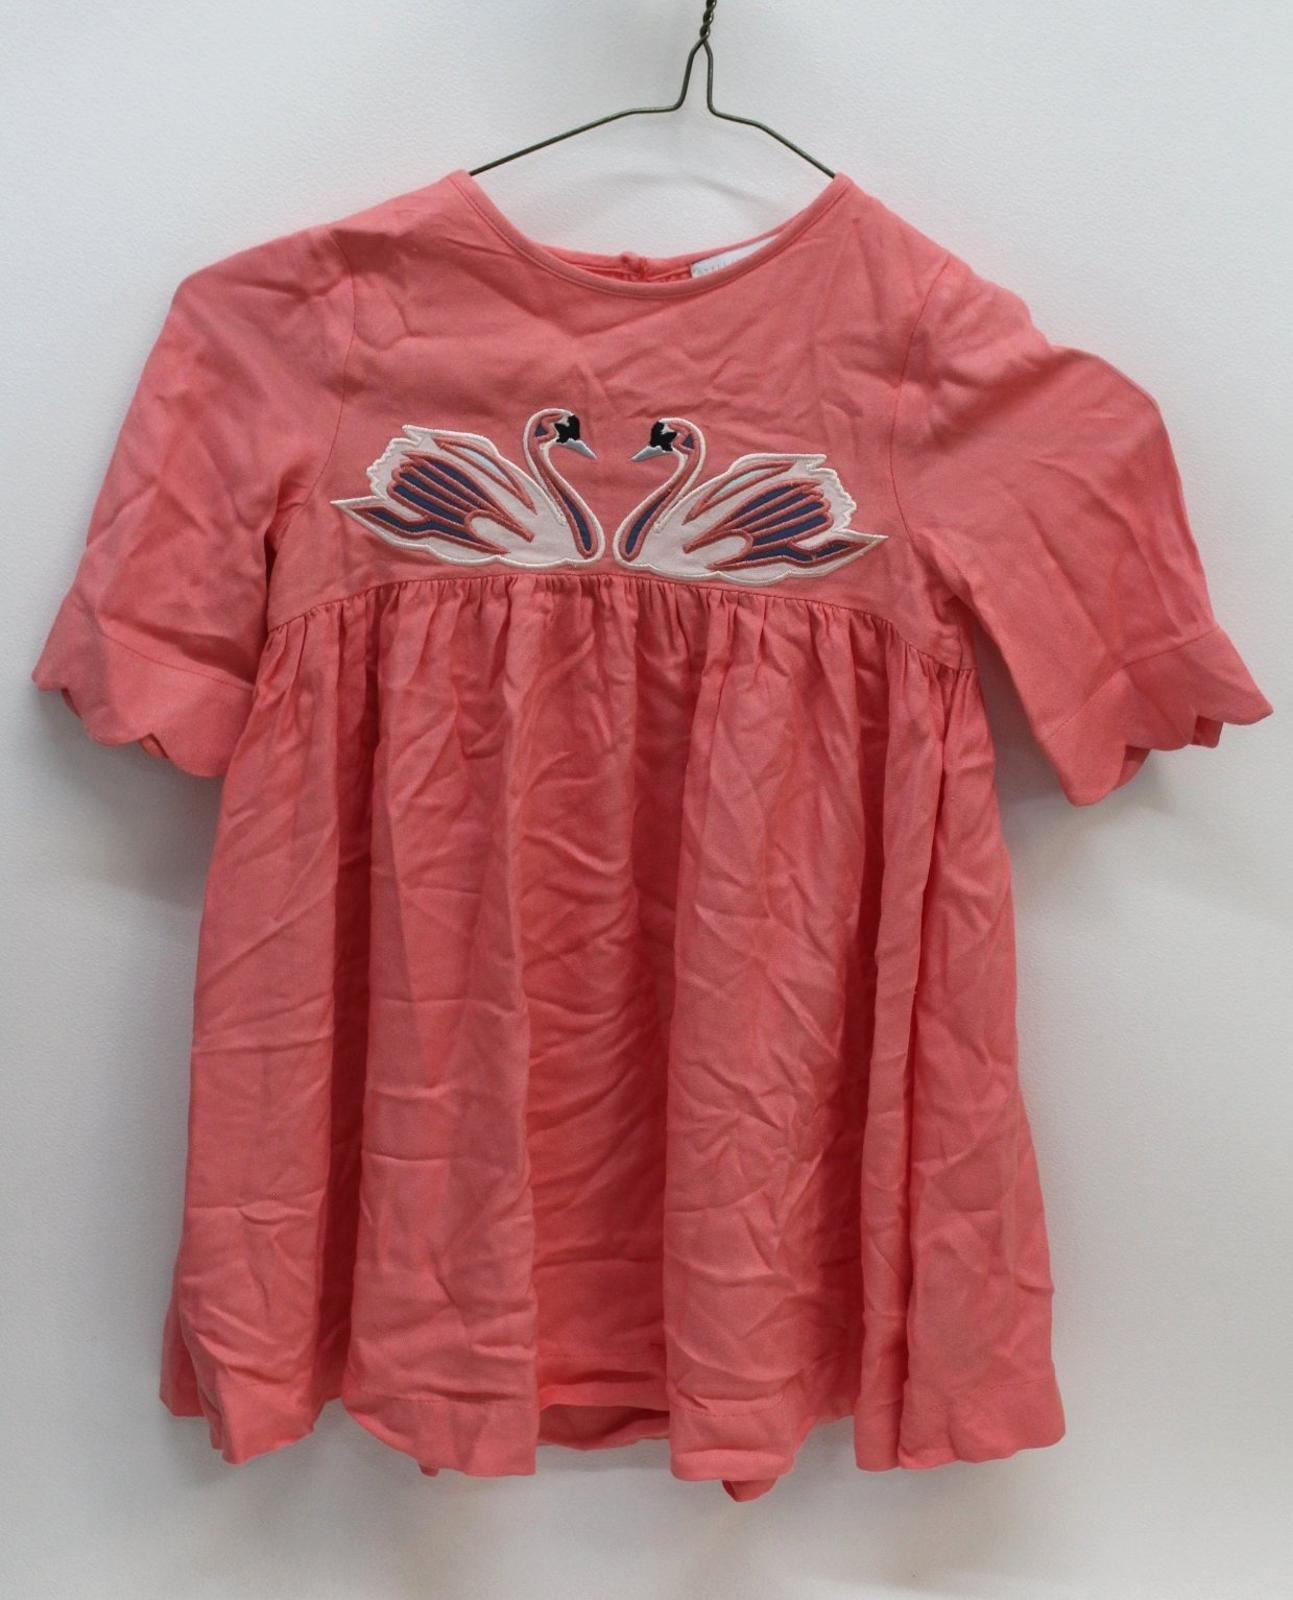 STELLA-MCCARTNEY-KIDS-Girls-Coral-Orange-3-4-Sleeve-Swan-Embroidery-Dress-4-Yrs